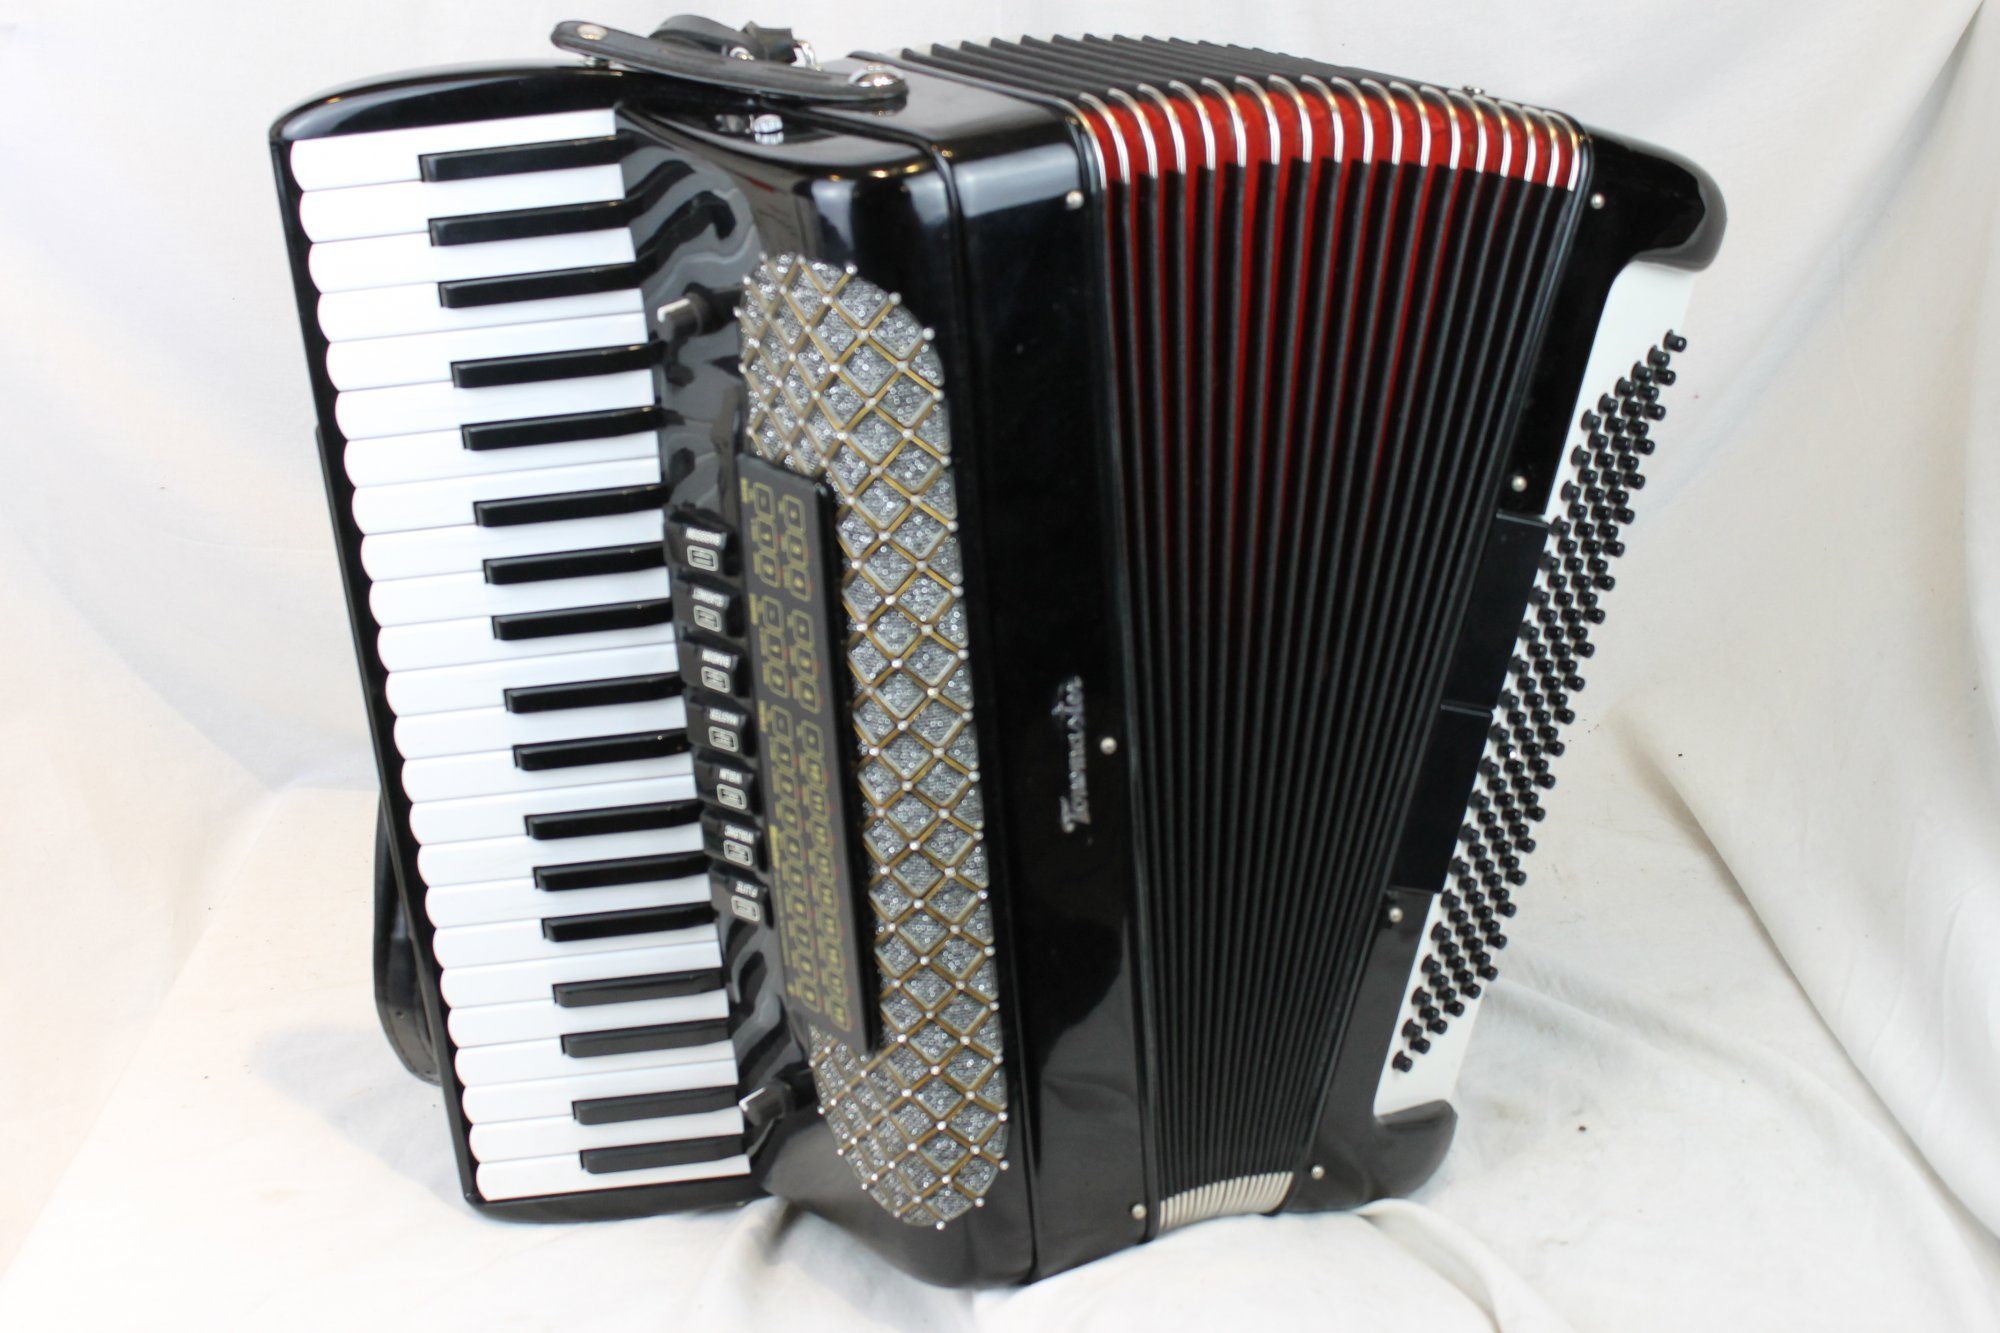 3481 - Black Tonemaster Piano Accordion LMM 41 120